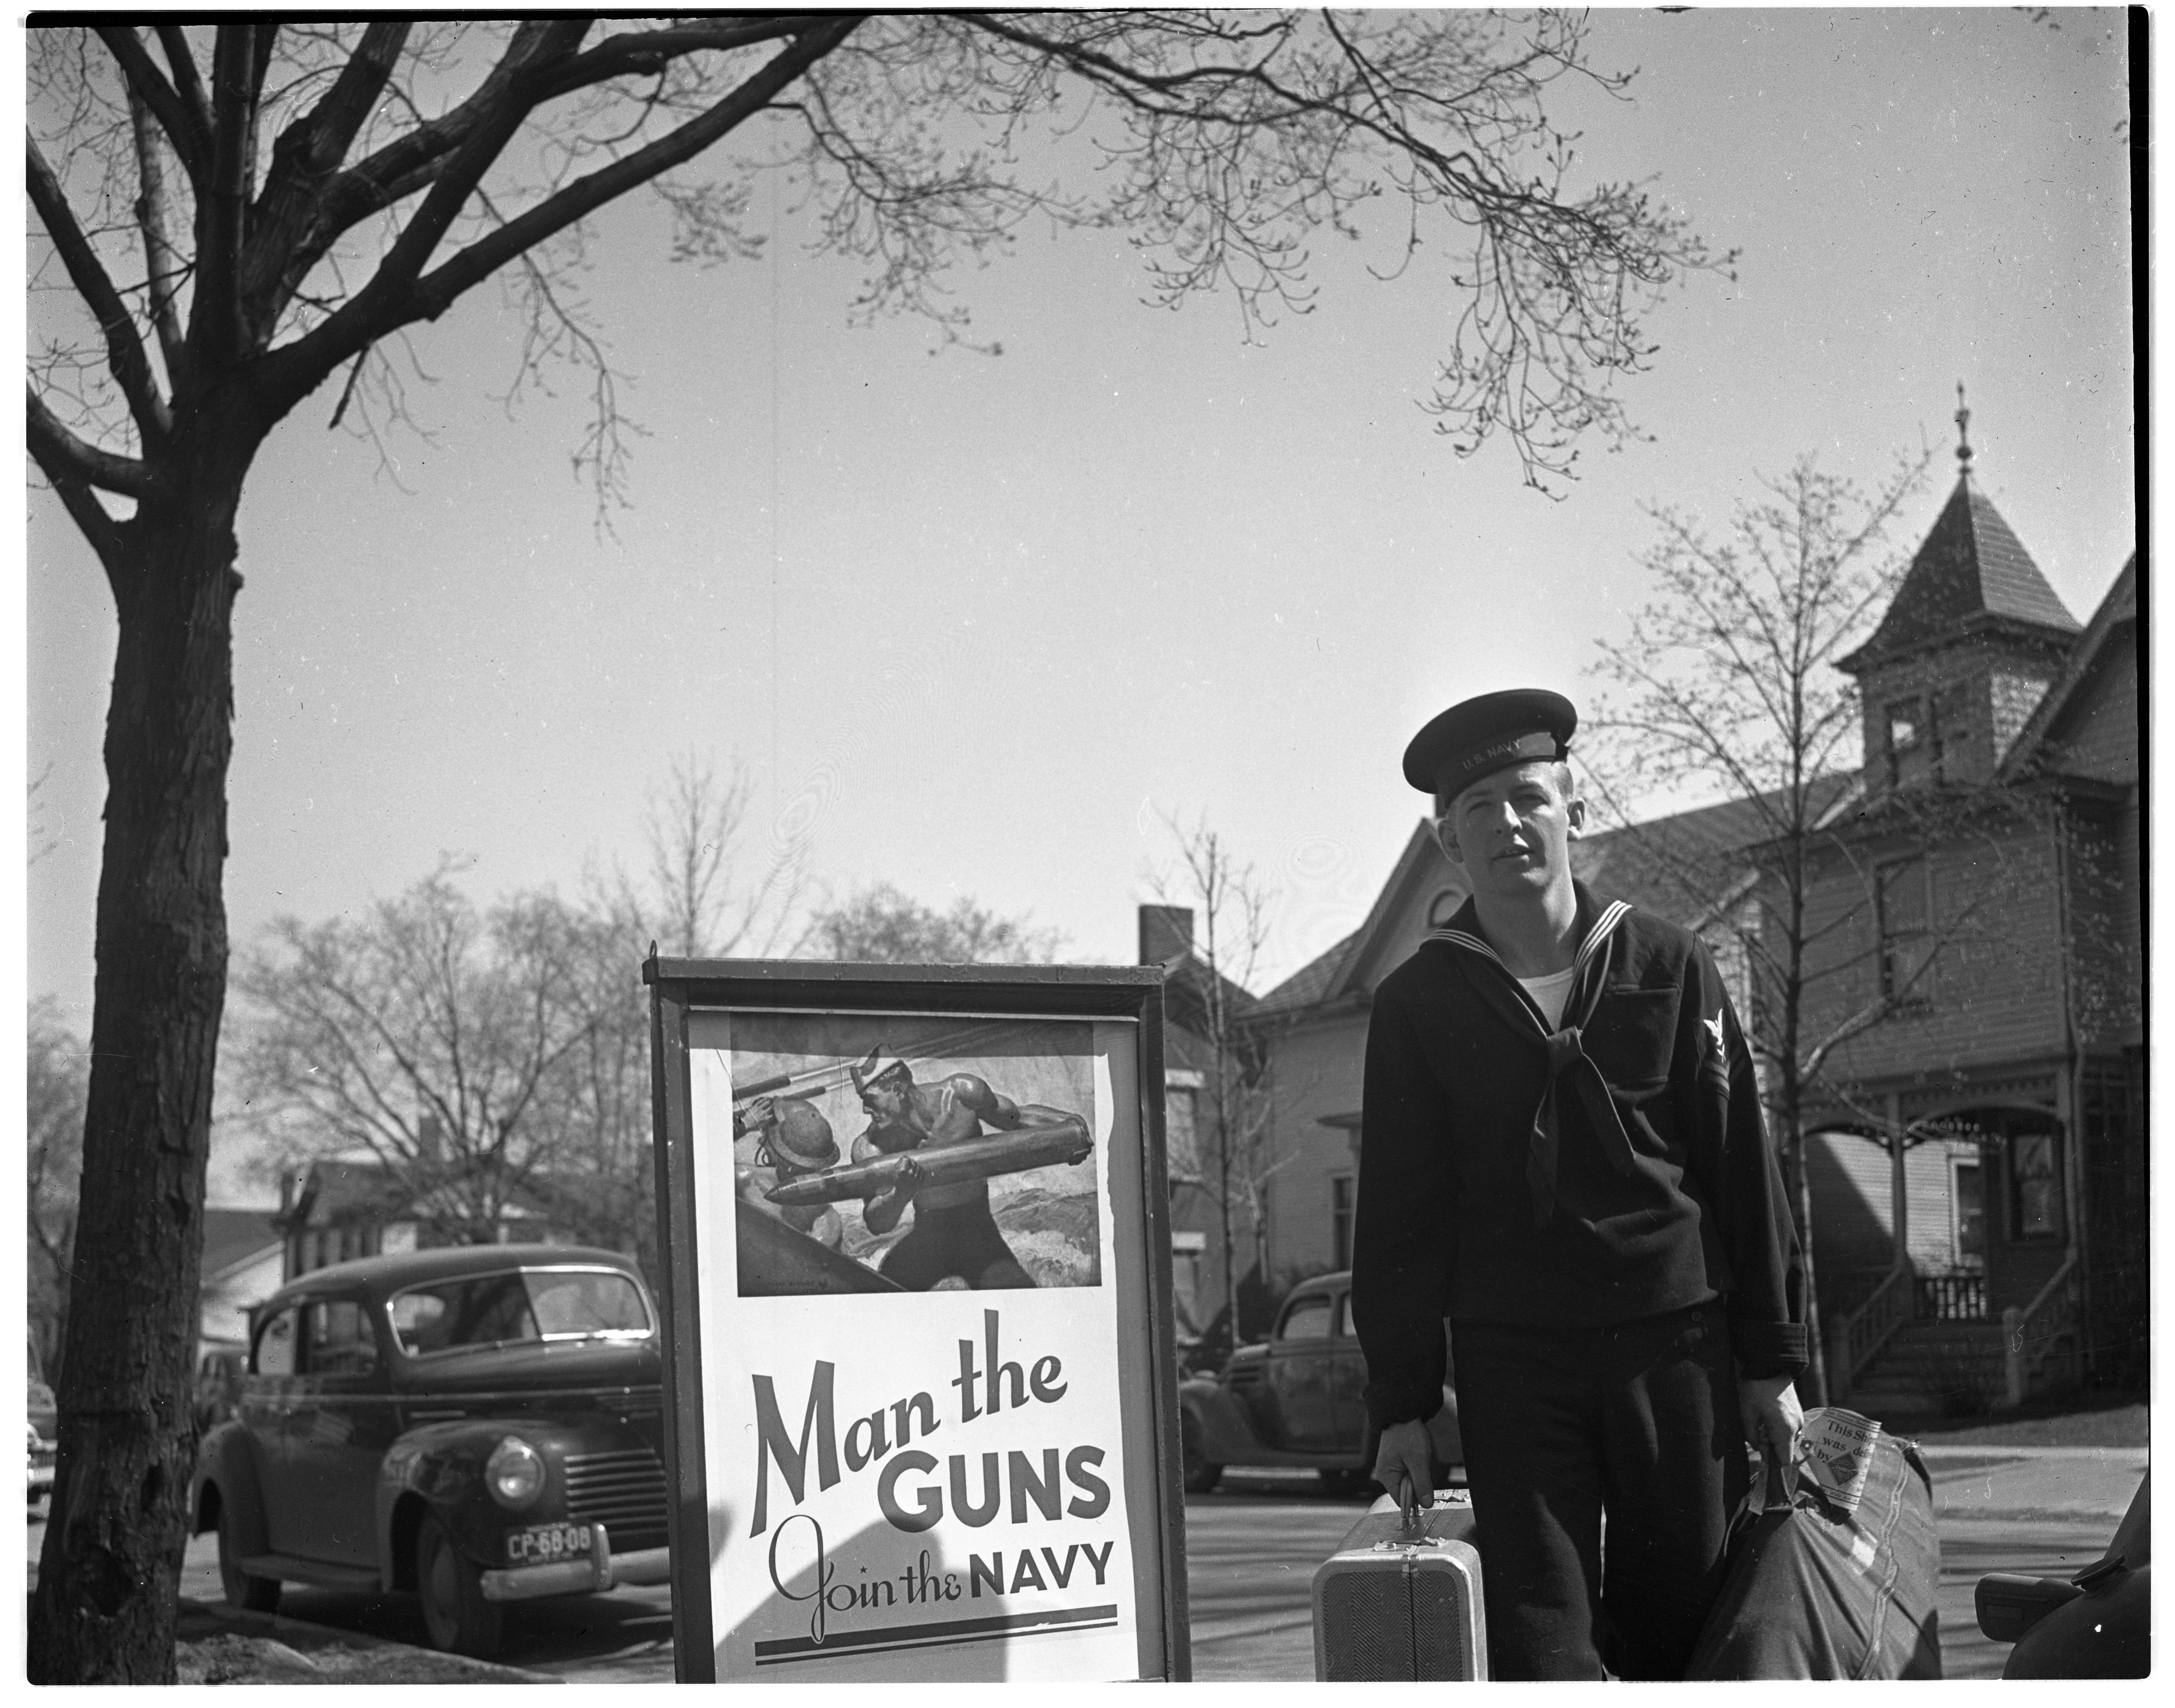 u s navy recruiter cotton price recruiting poster in ann u s navy recruiter cotton price recruiting poster in ann arbor 1942